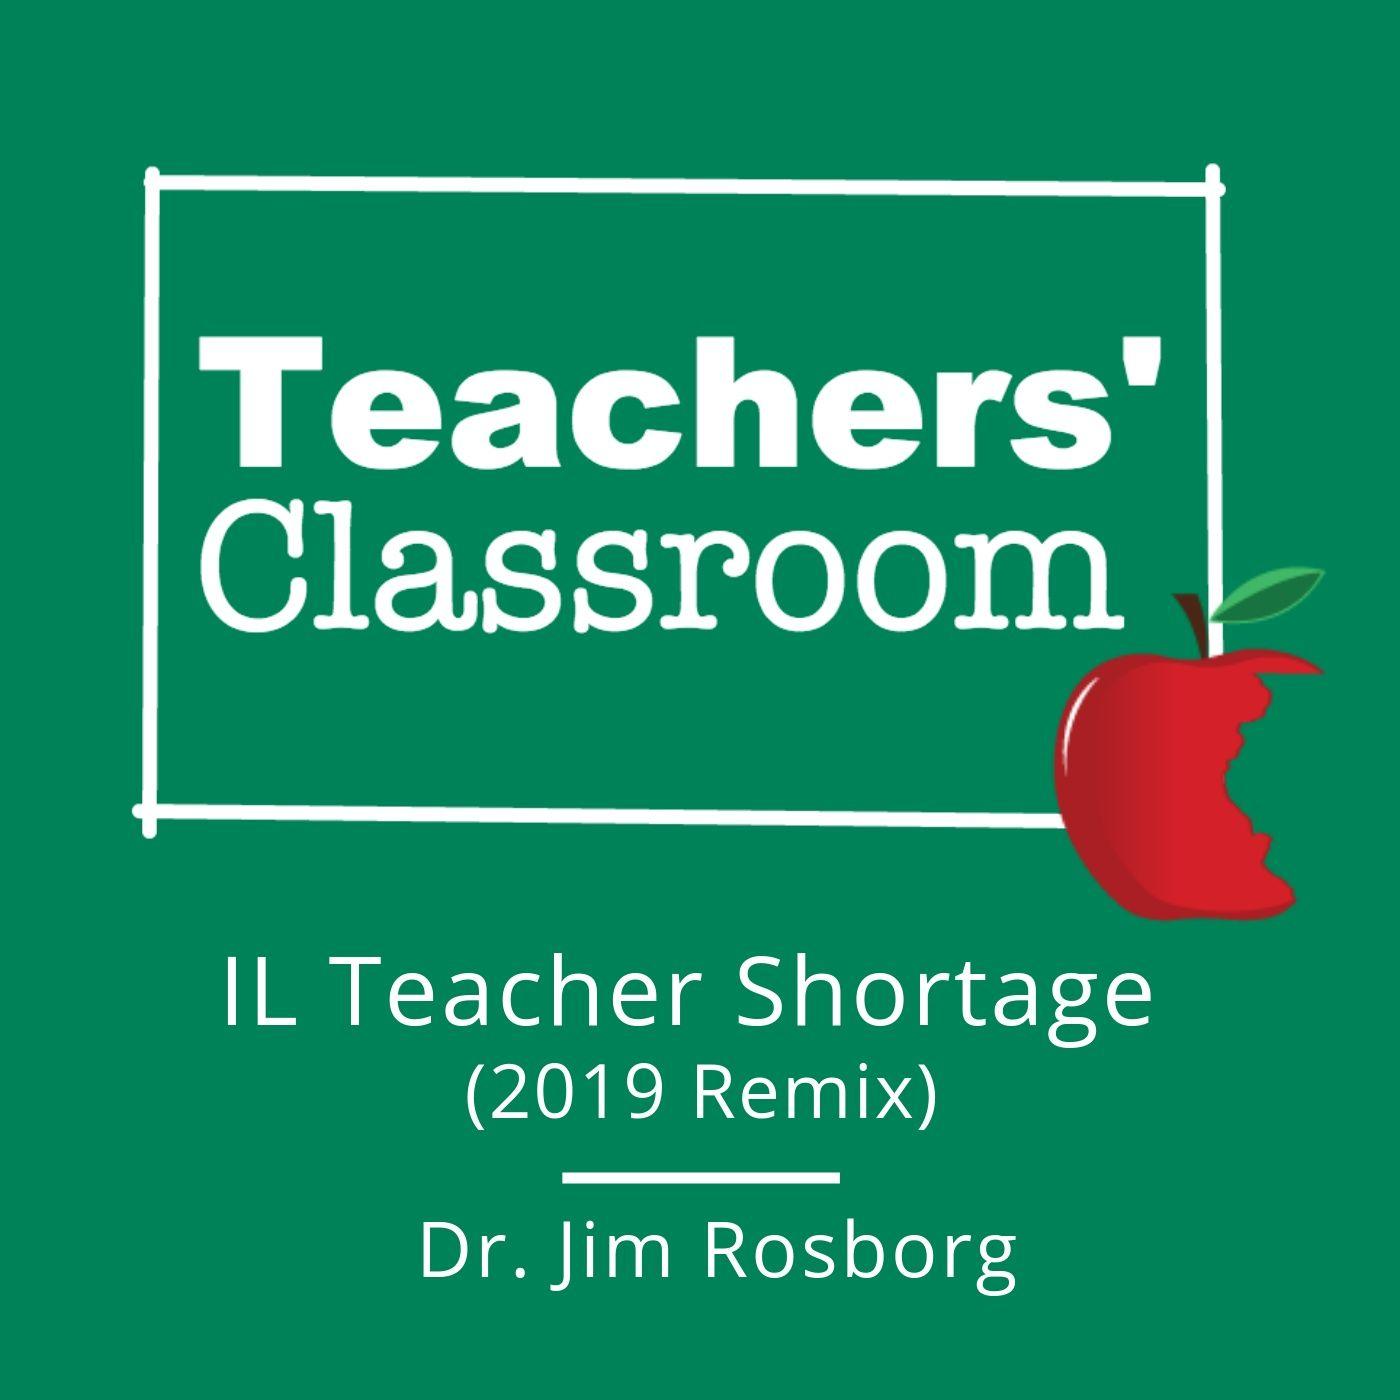 Illinois Teacher Shortage (2019 ReMix)